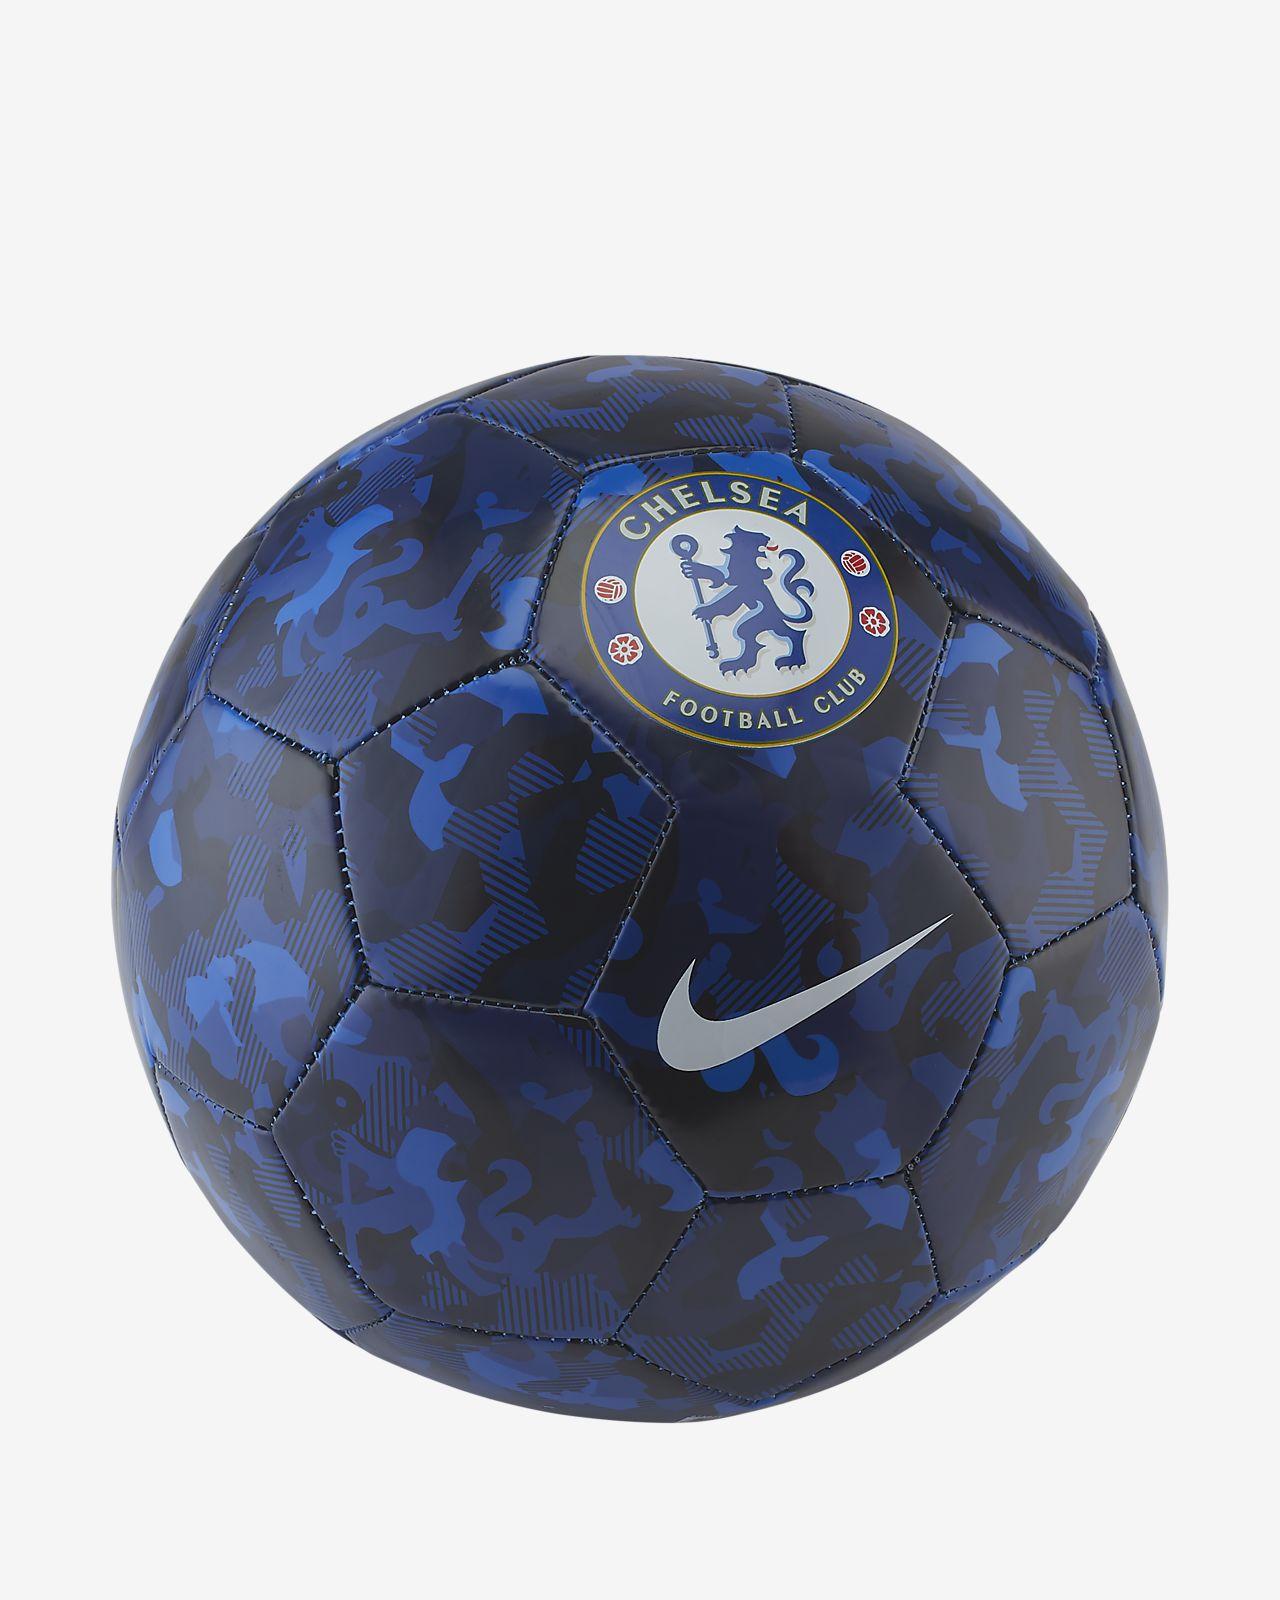 Bola de futebol Chelsea FC Supporters. Nike.com PT 9fe59bd3492bf